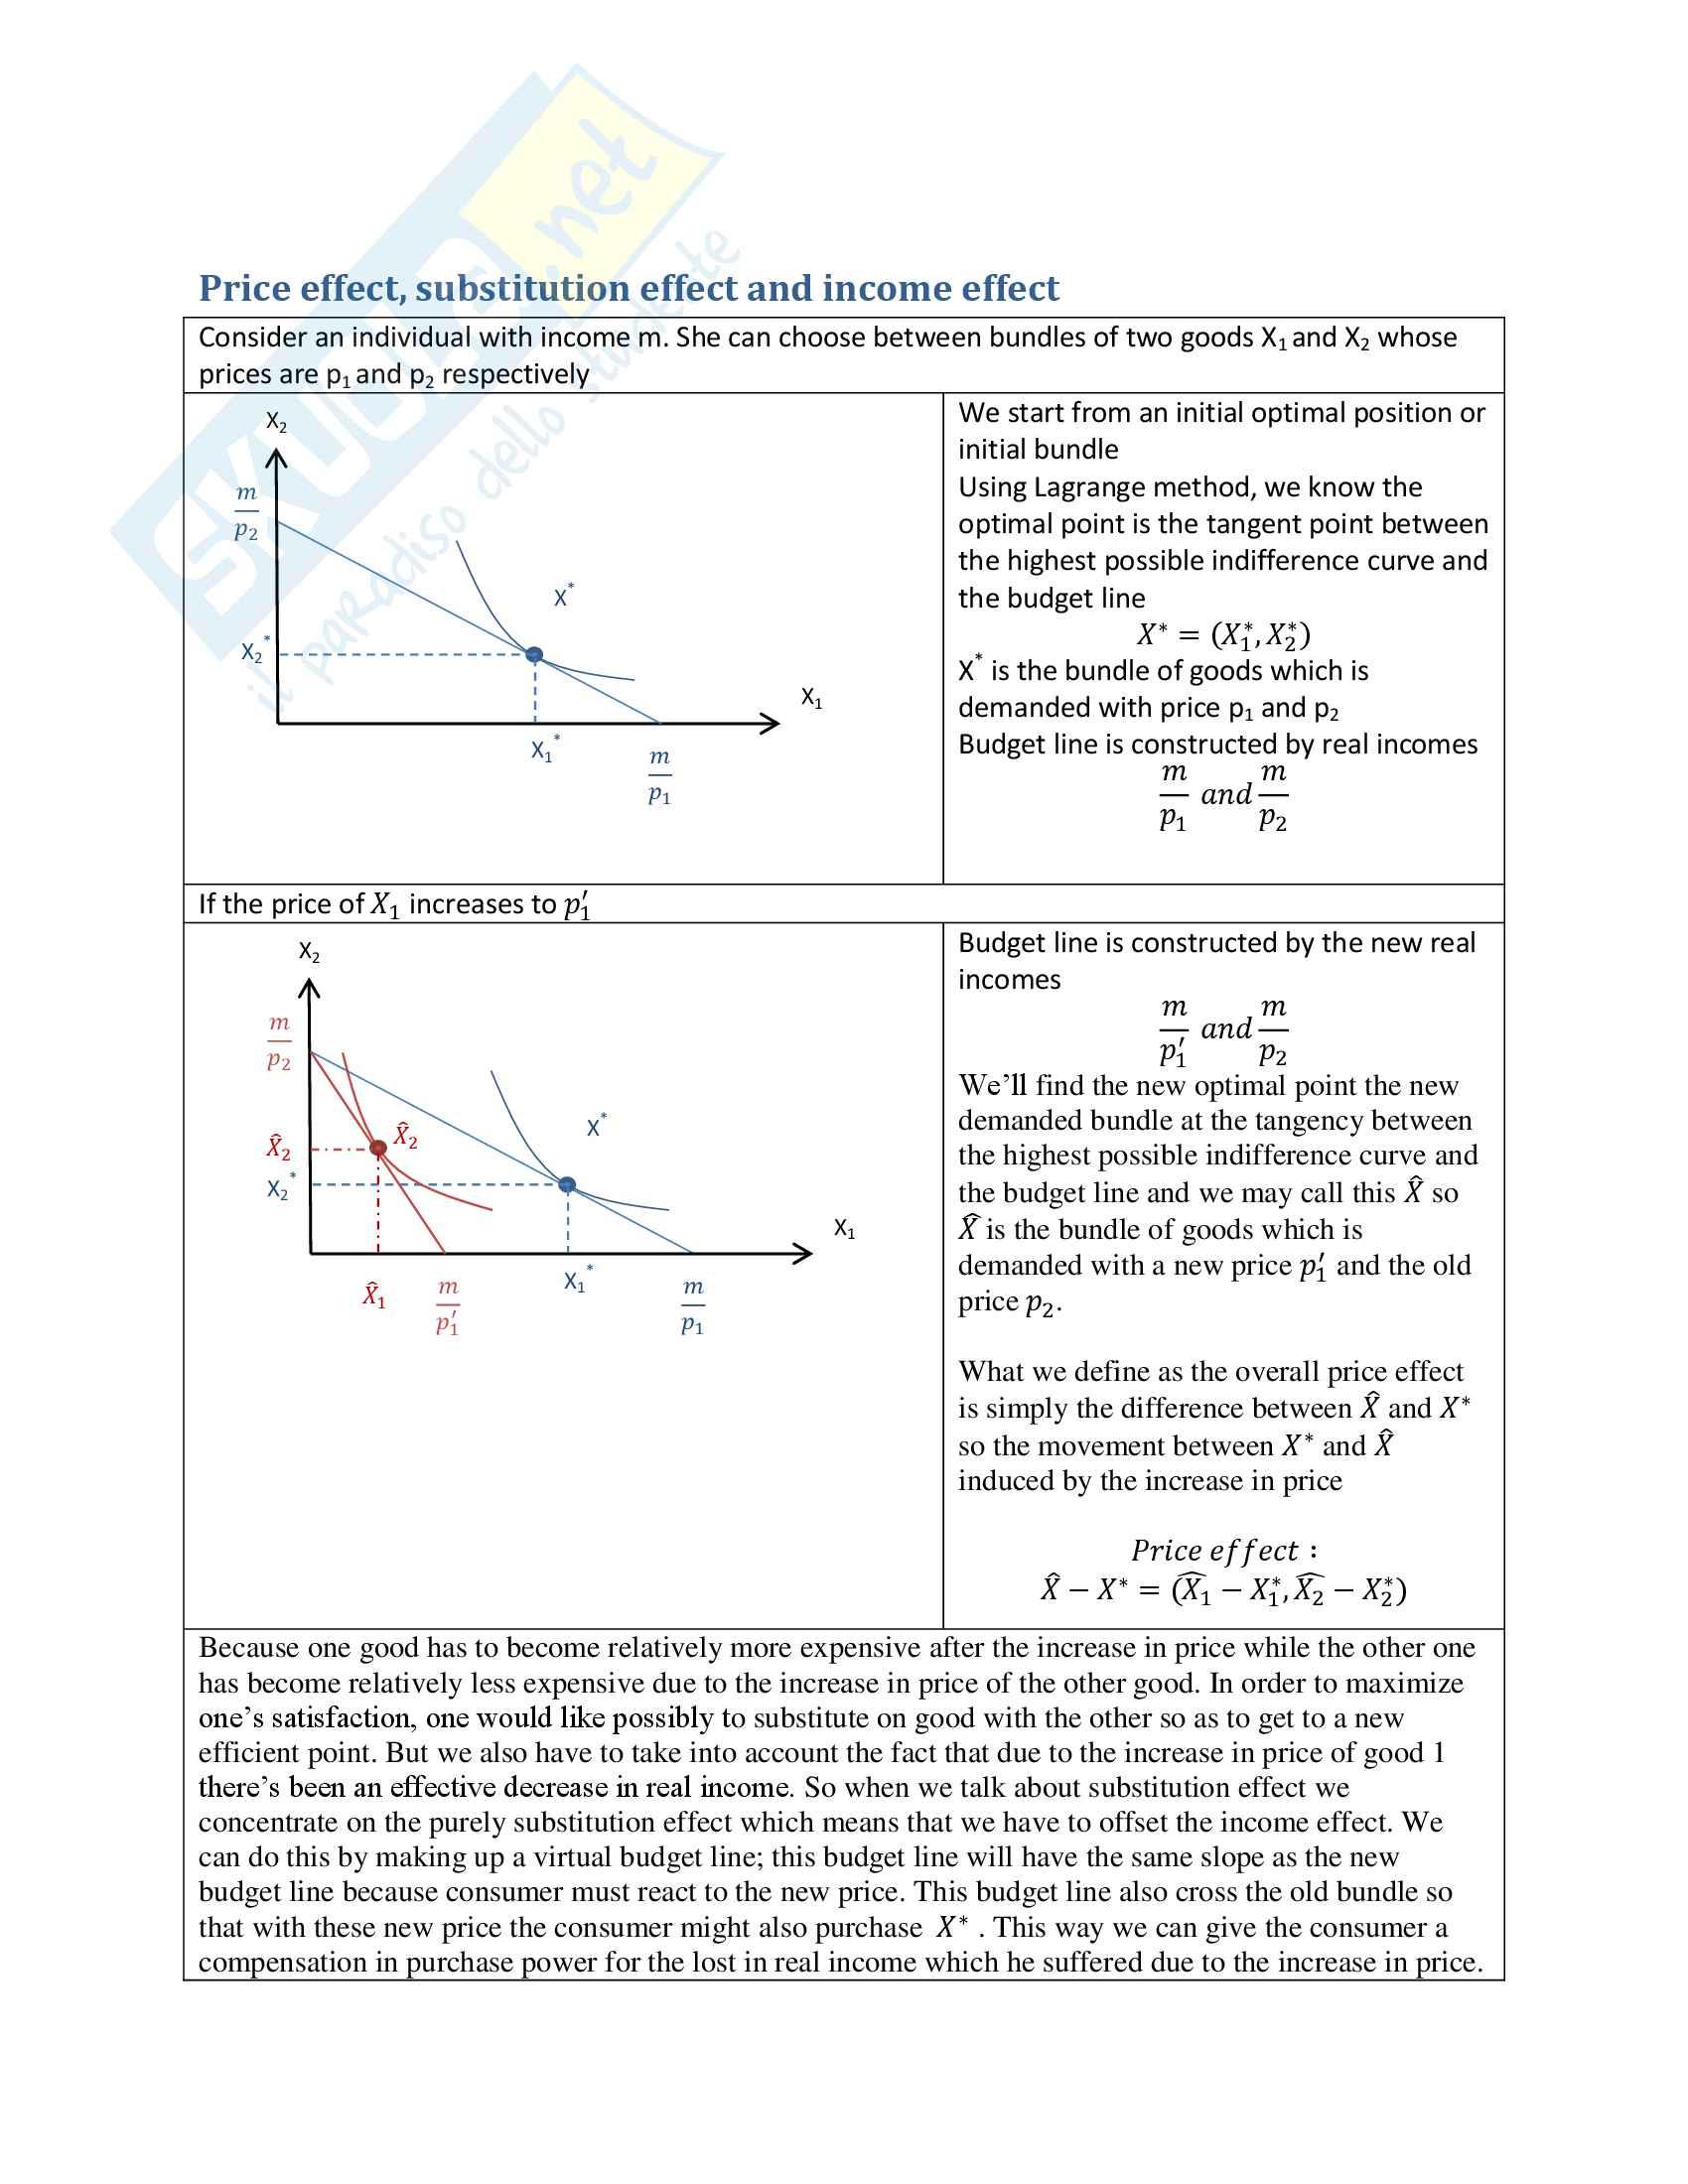 Managerial economics guide 2